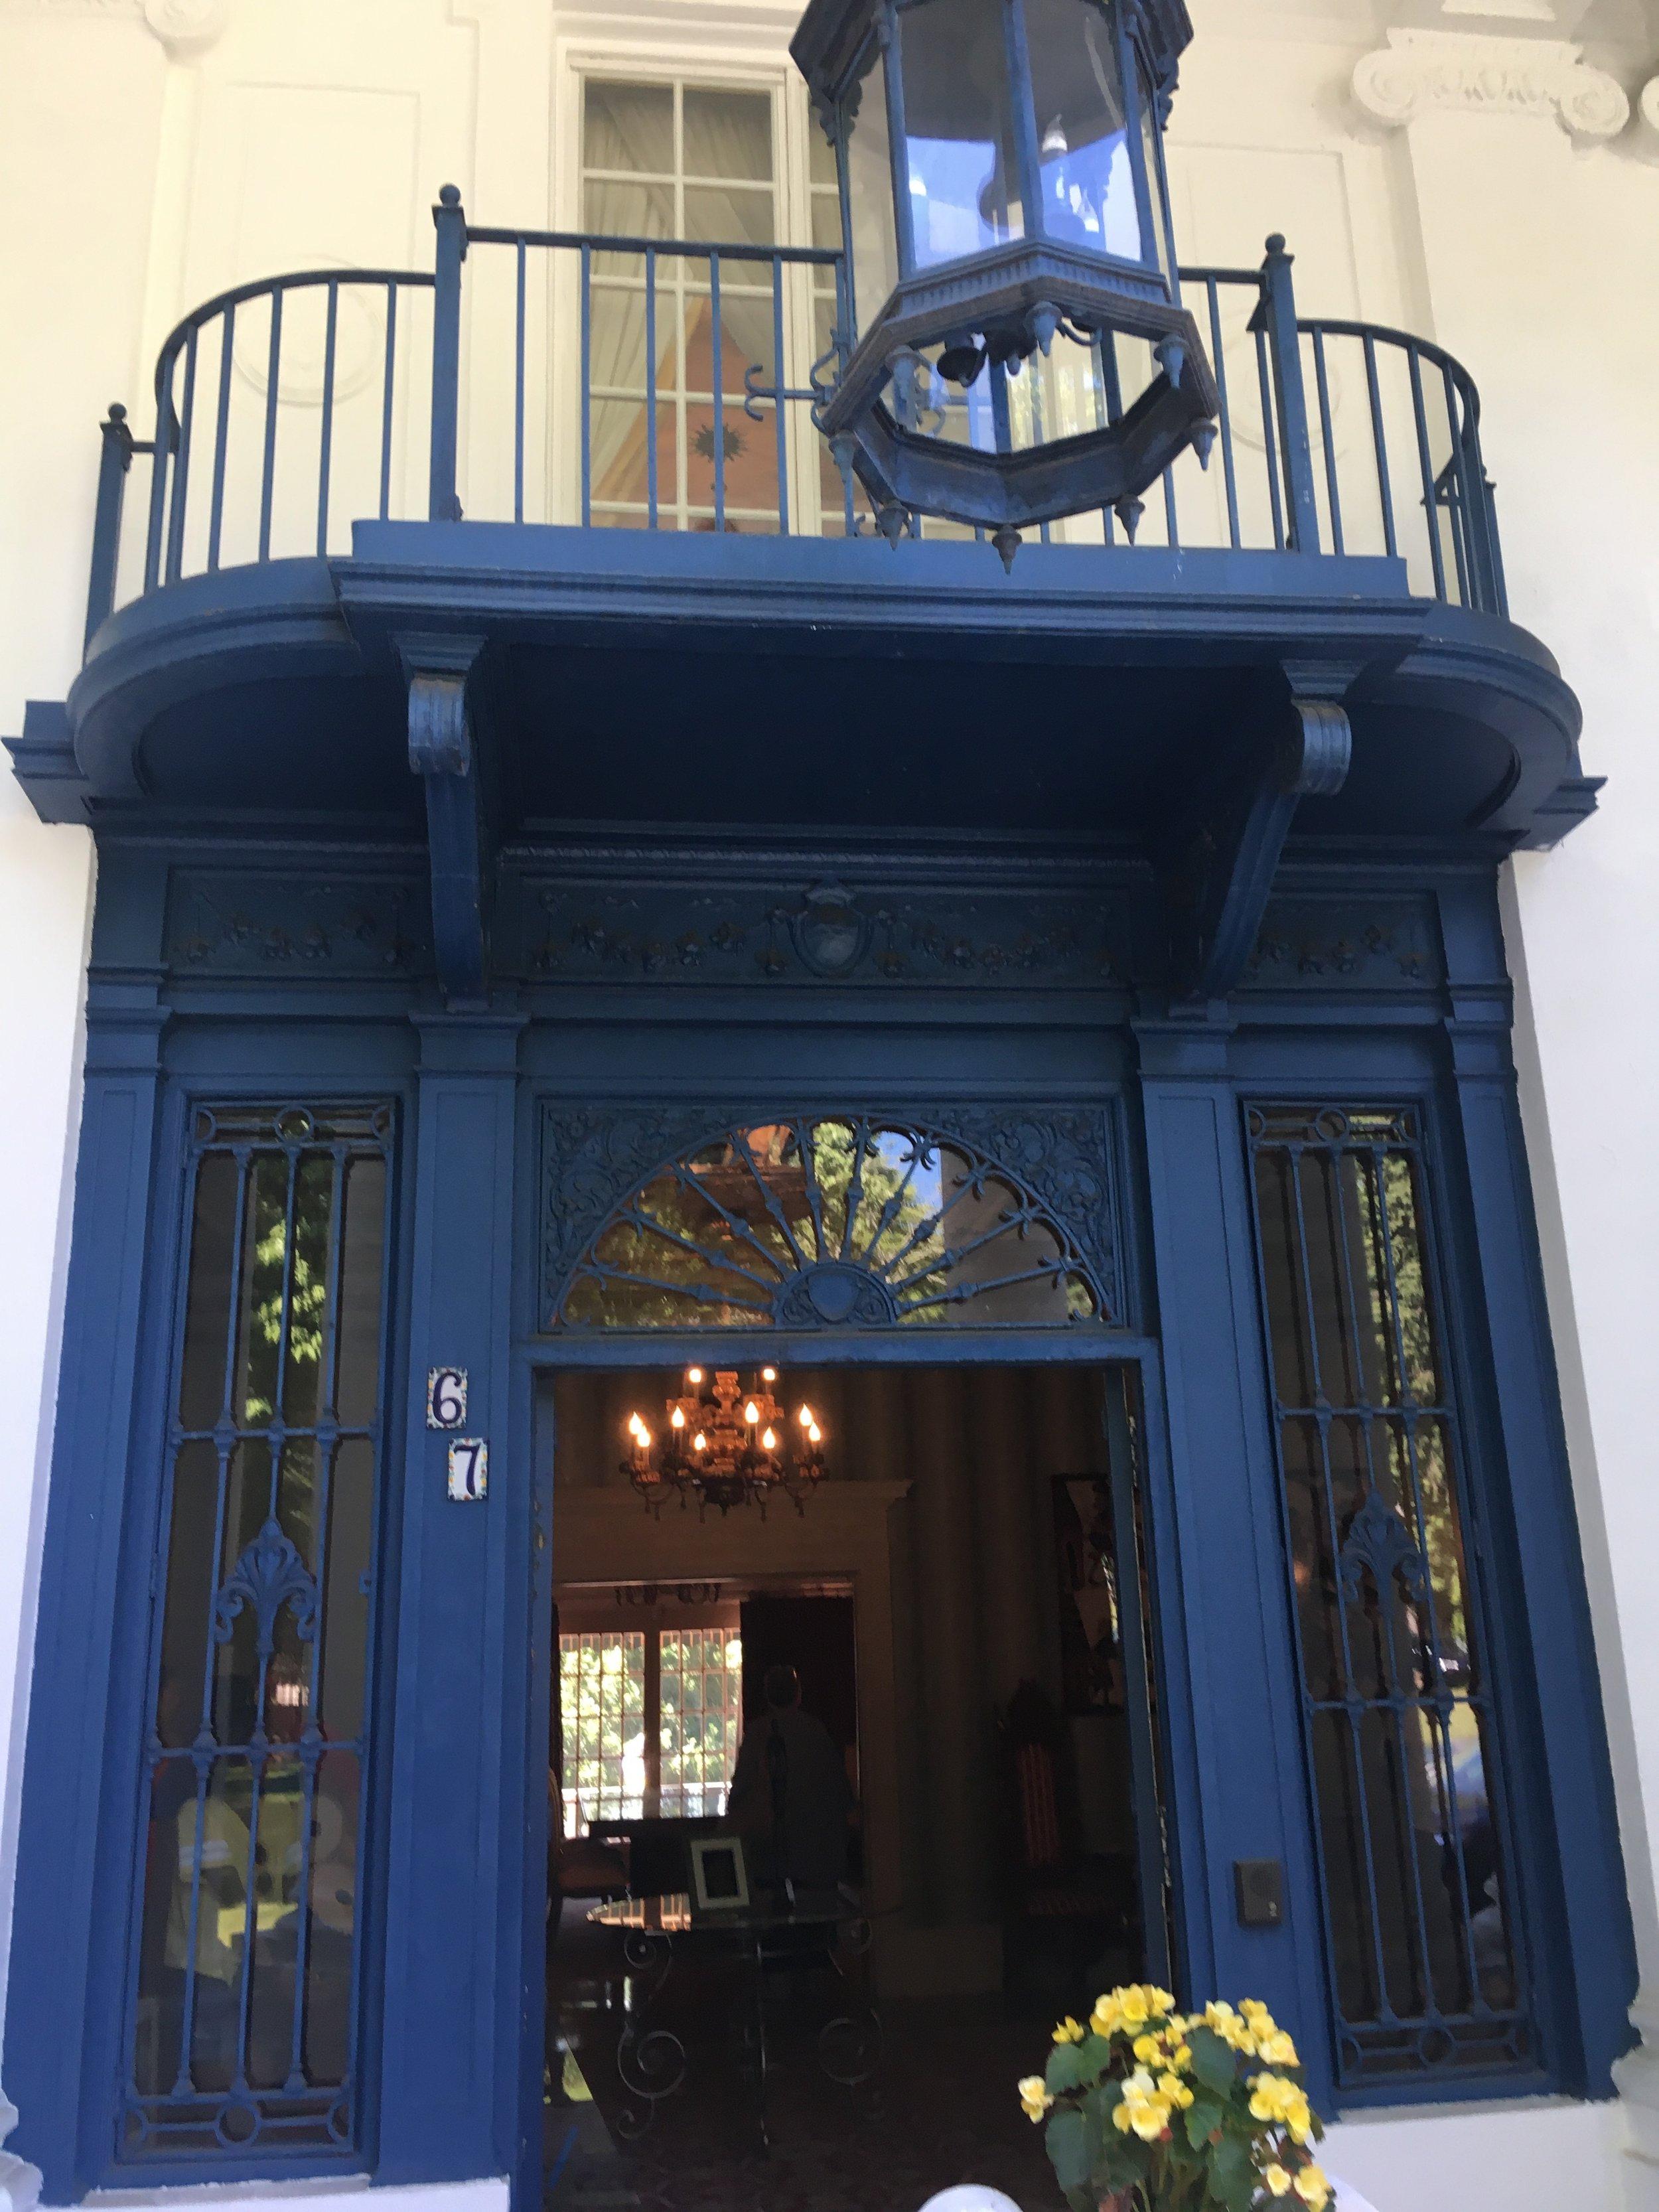 Villa Lewaro Blue Entryway - Photo by Tevra F.